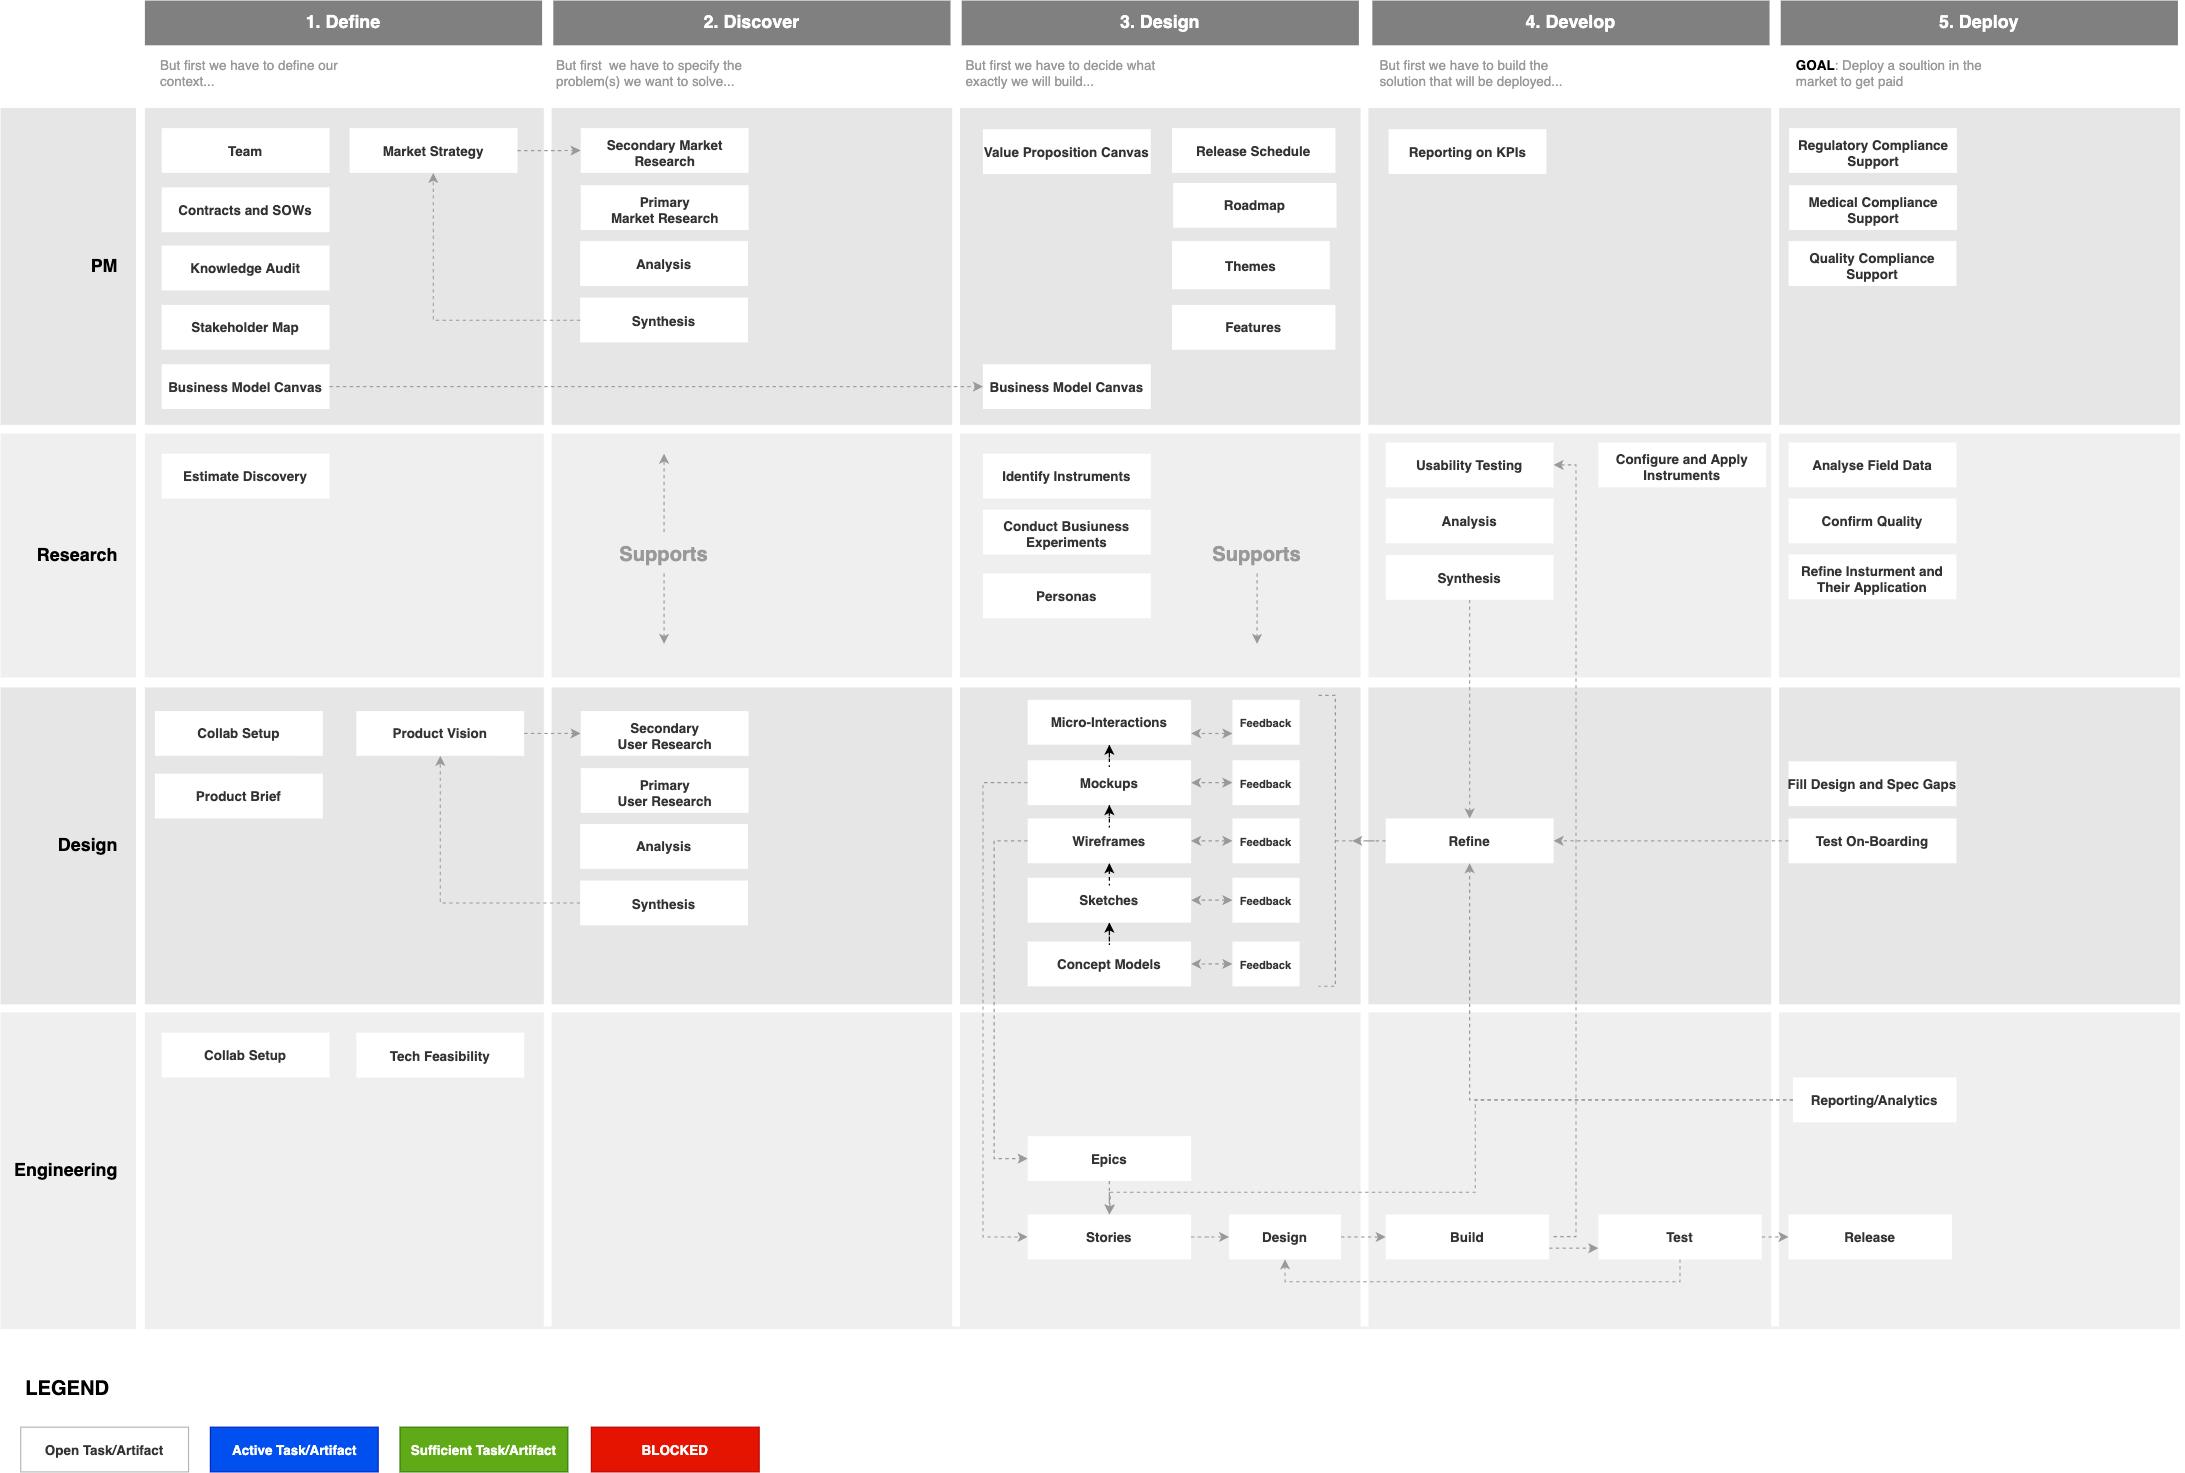 Product Development Process - Activities